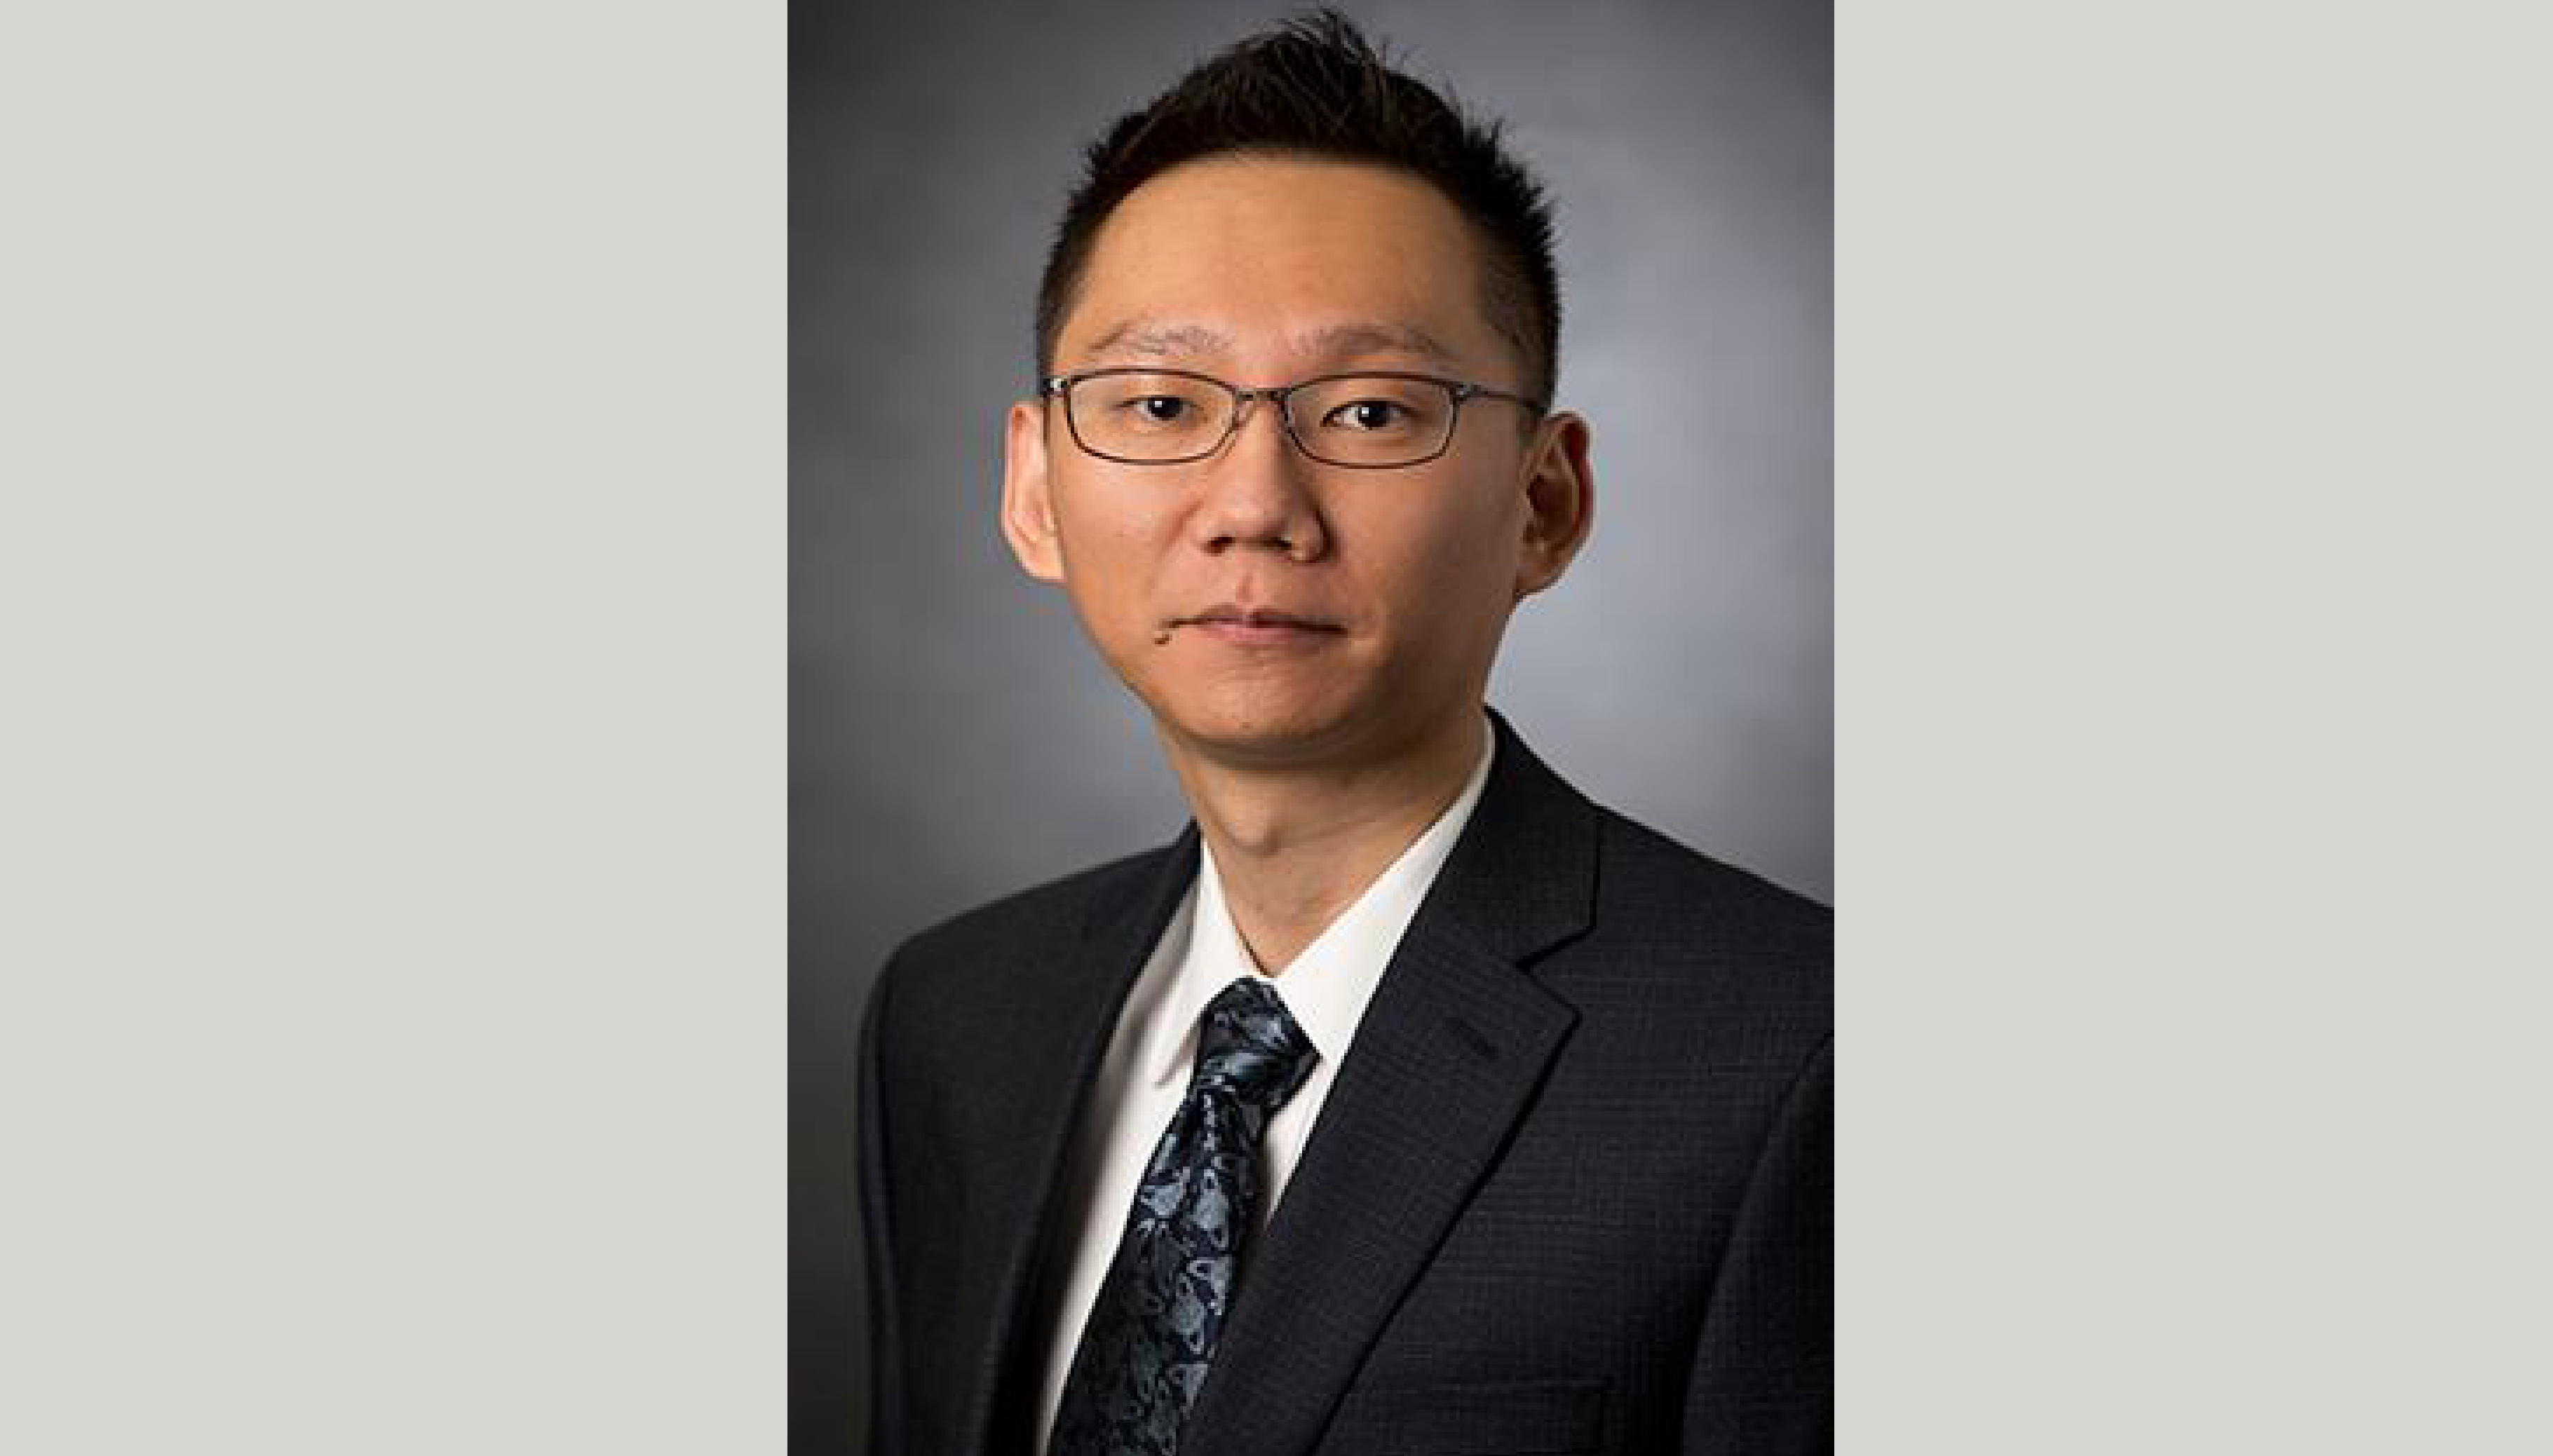 Dr. Takashi Takahashi